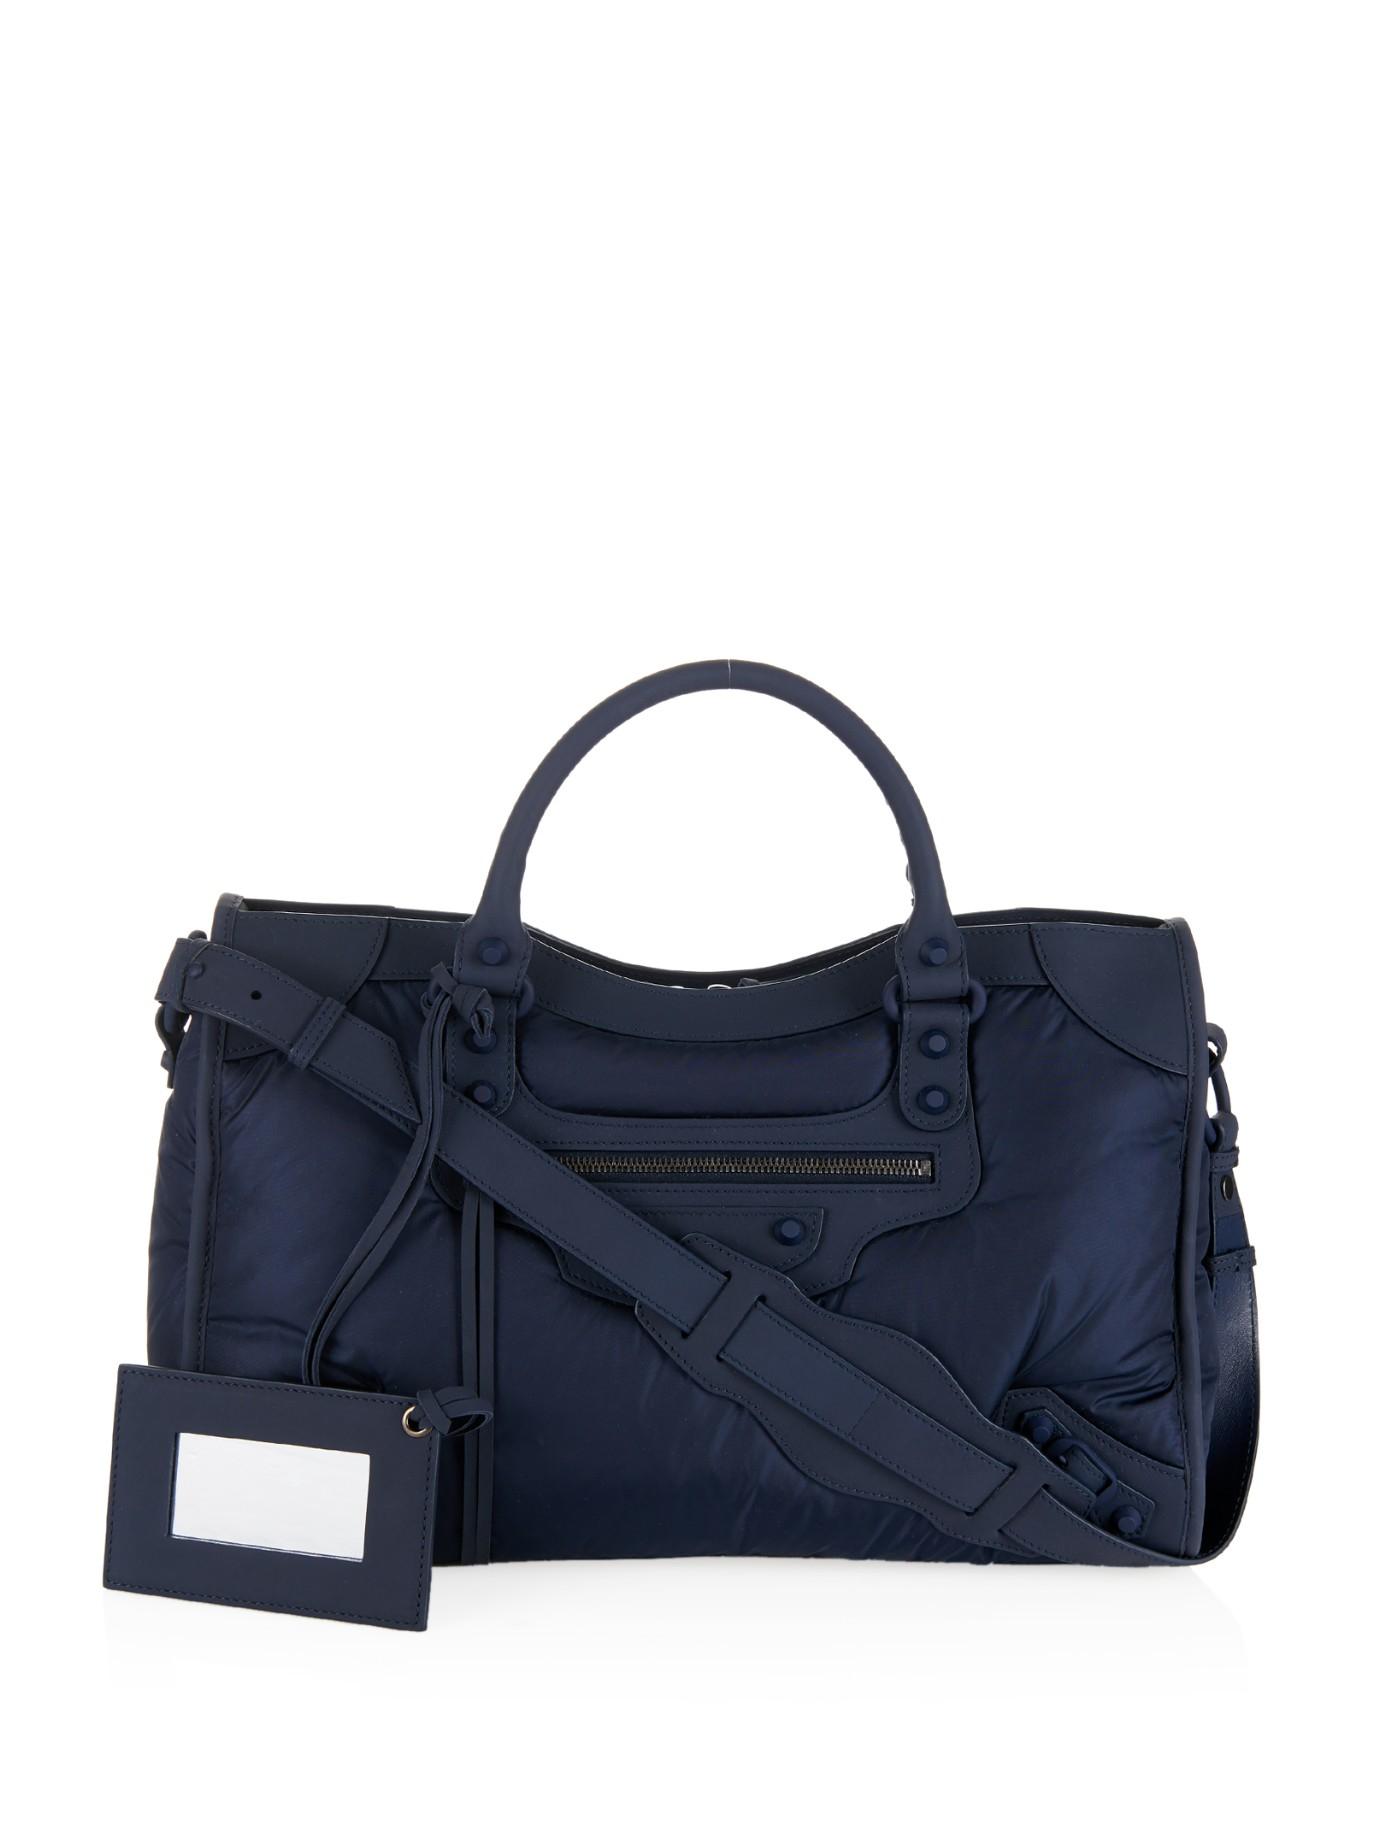 Balenciaga Classic City Nylon Bag In Blue Lyst